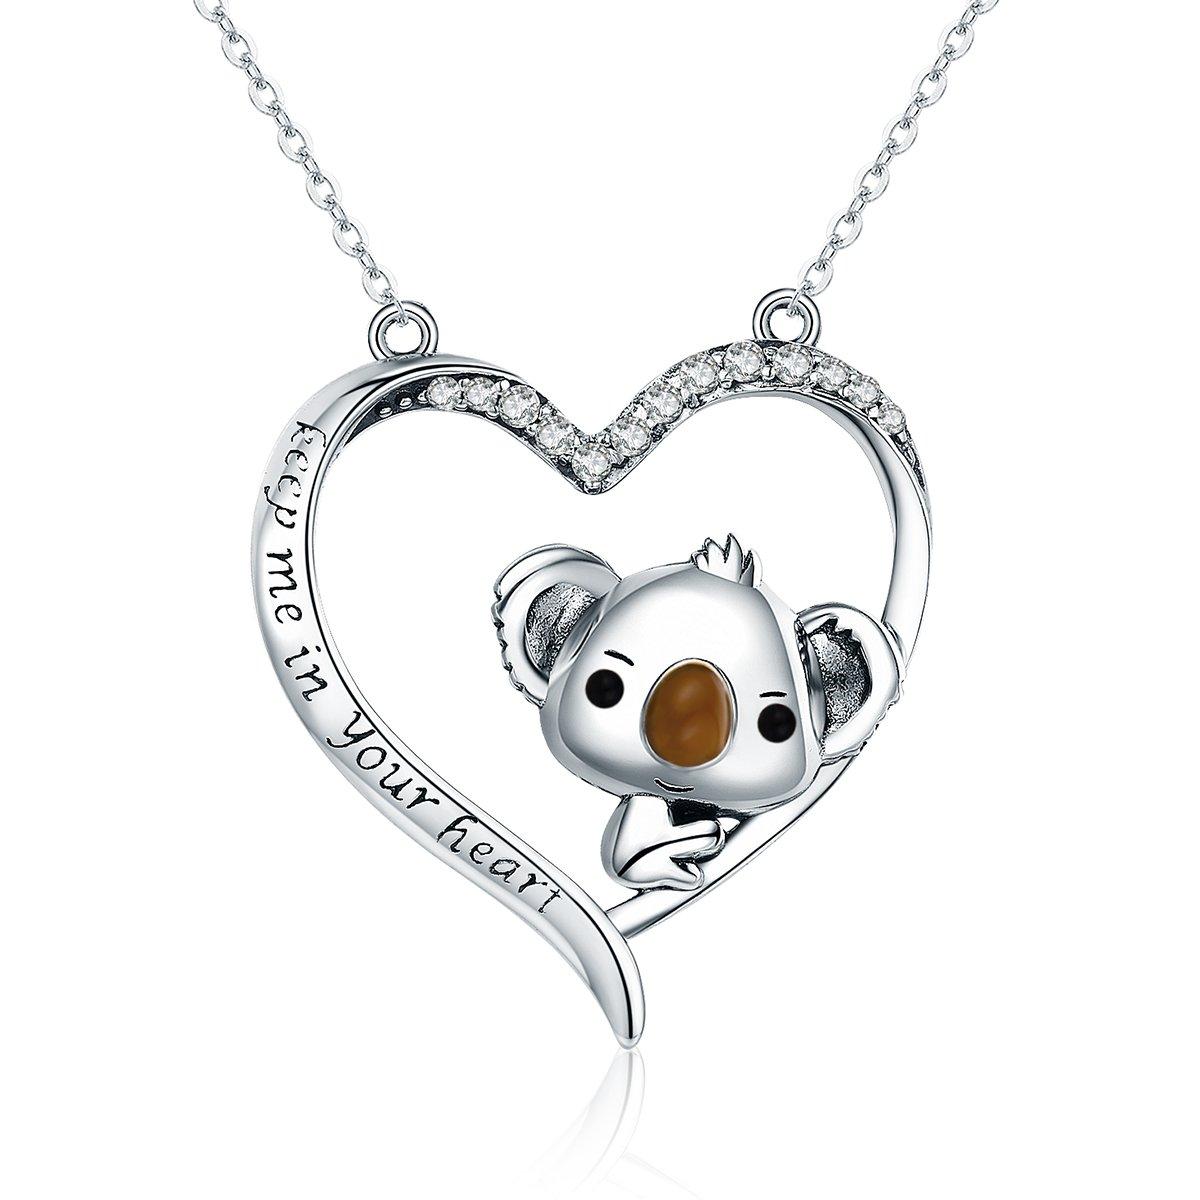 NEWL 925 Sterling Silver Lovely Koala in Heart Pendant Necklaces for Women Sterling Silver Jewelry